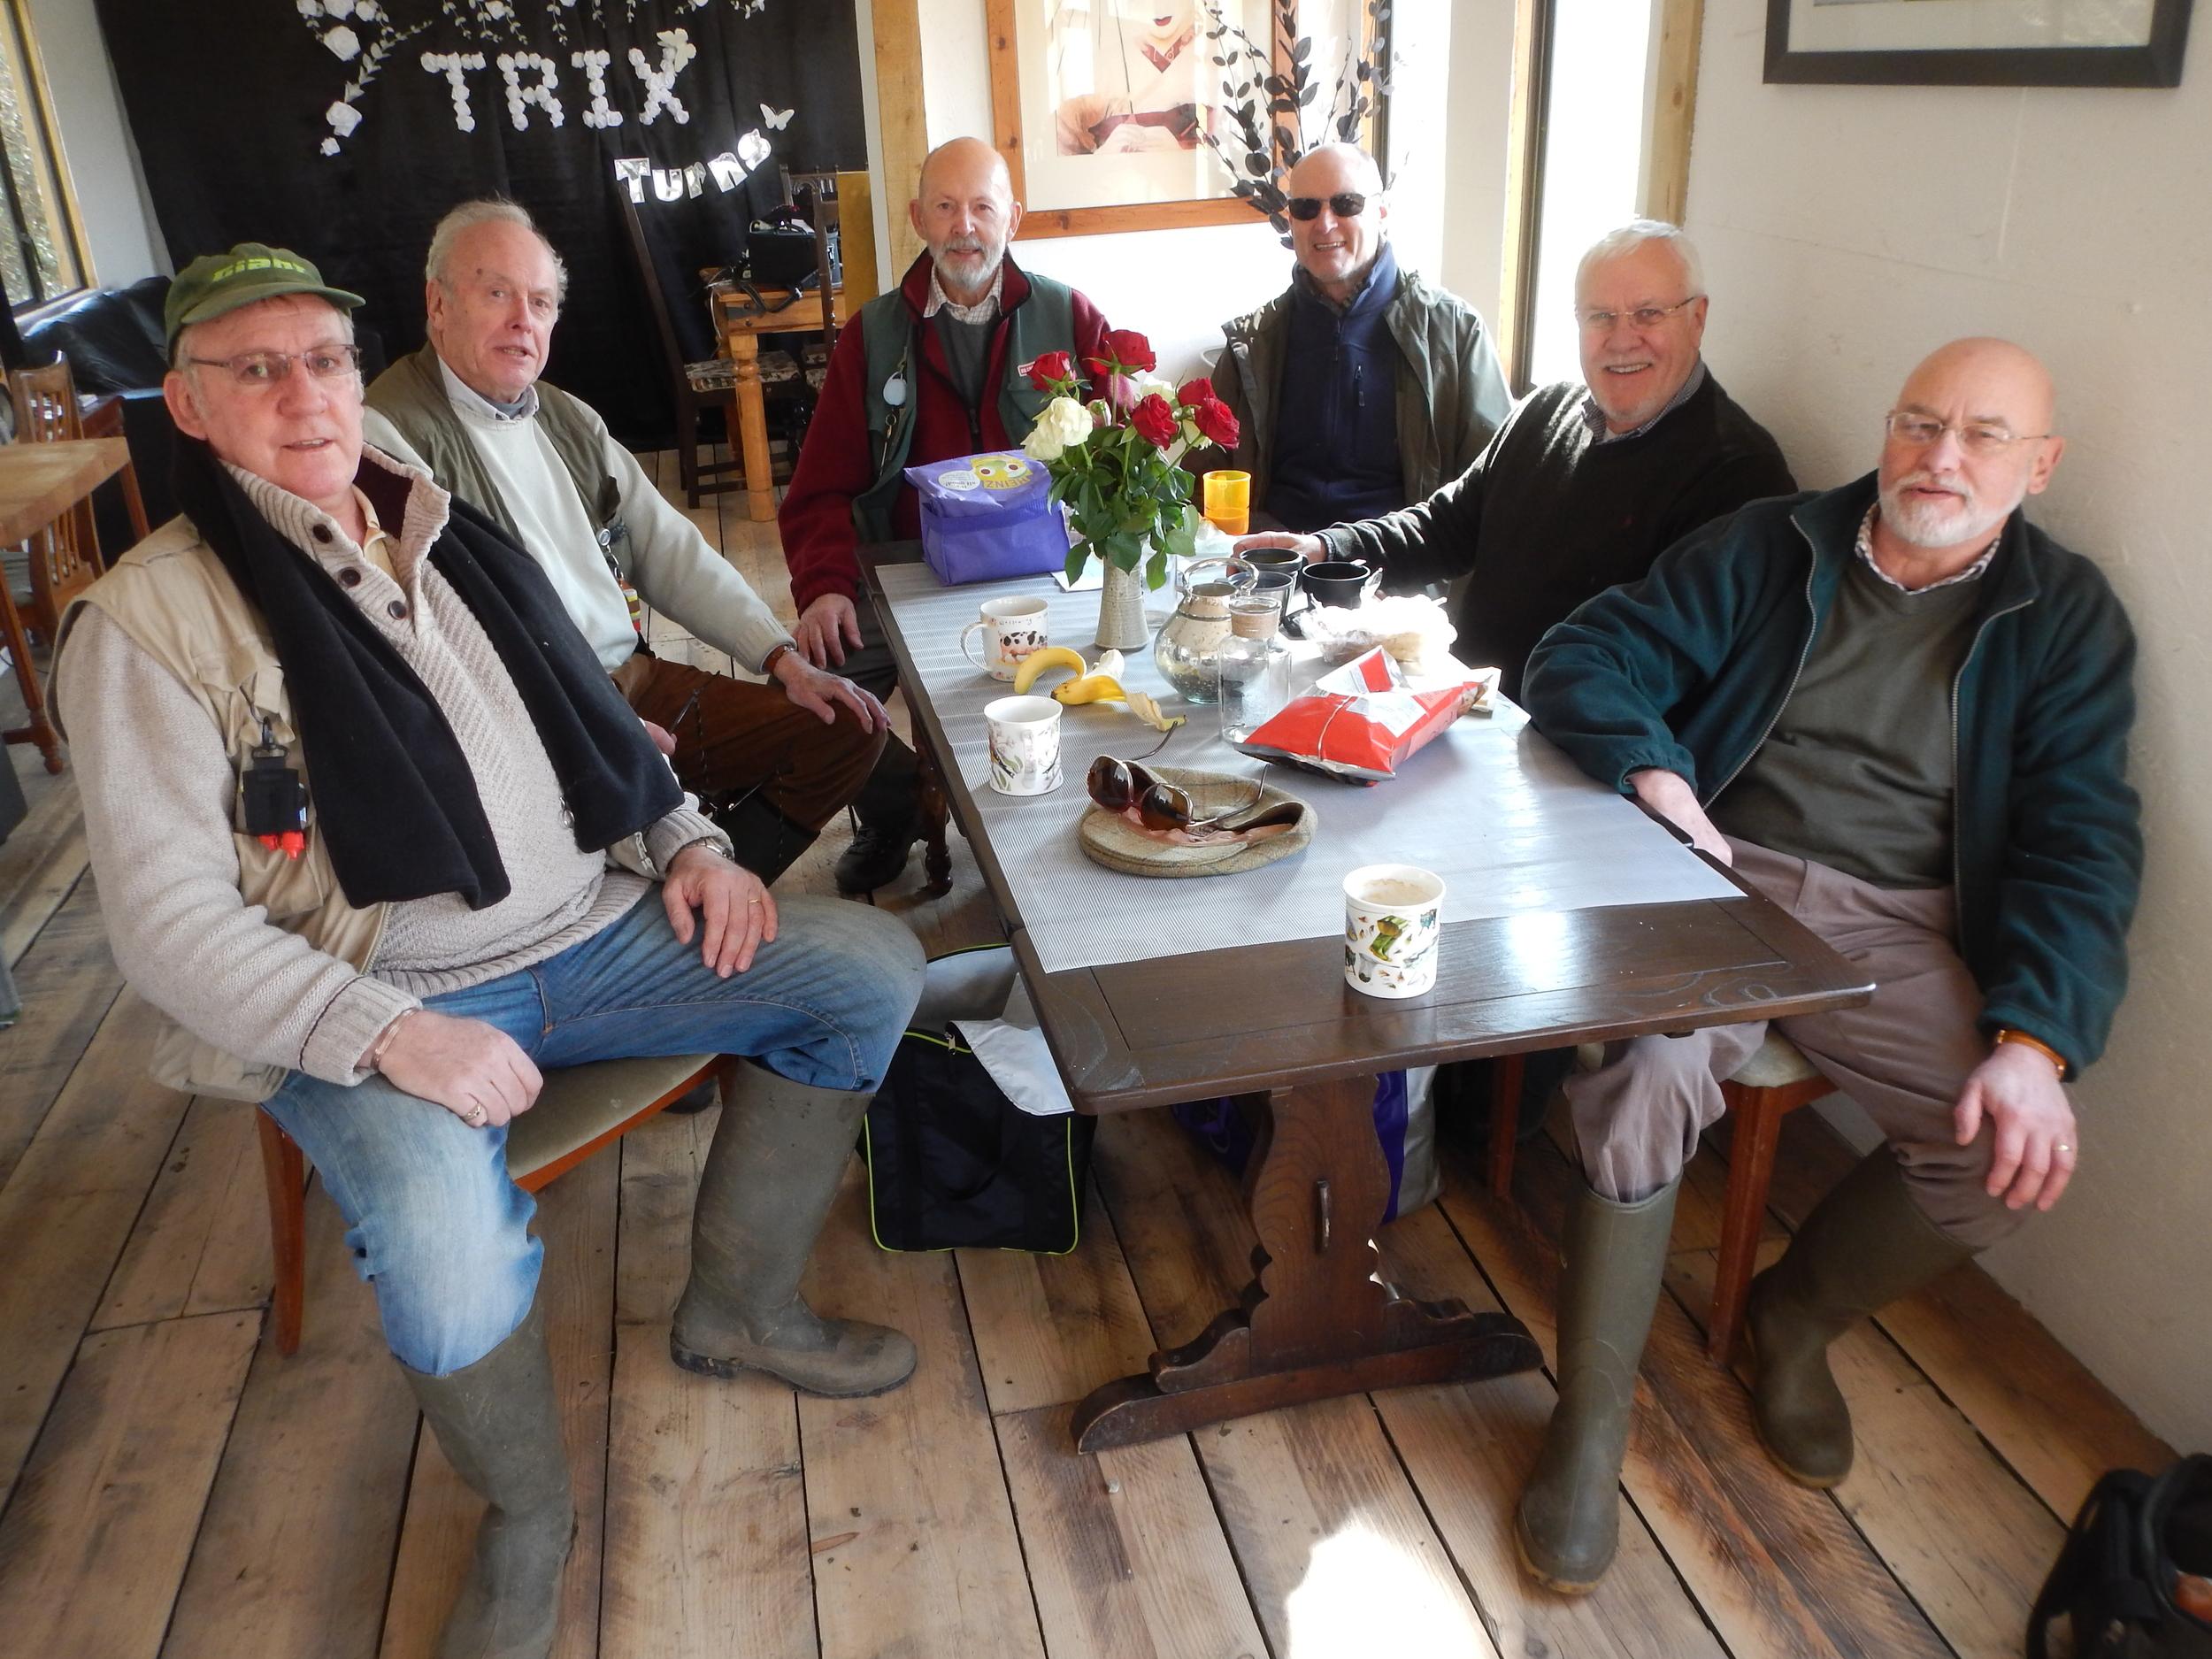 Robert, Granville, Gerry, Alan, Tony